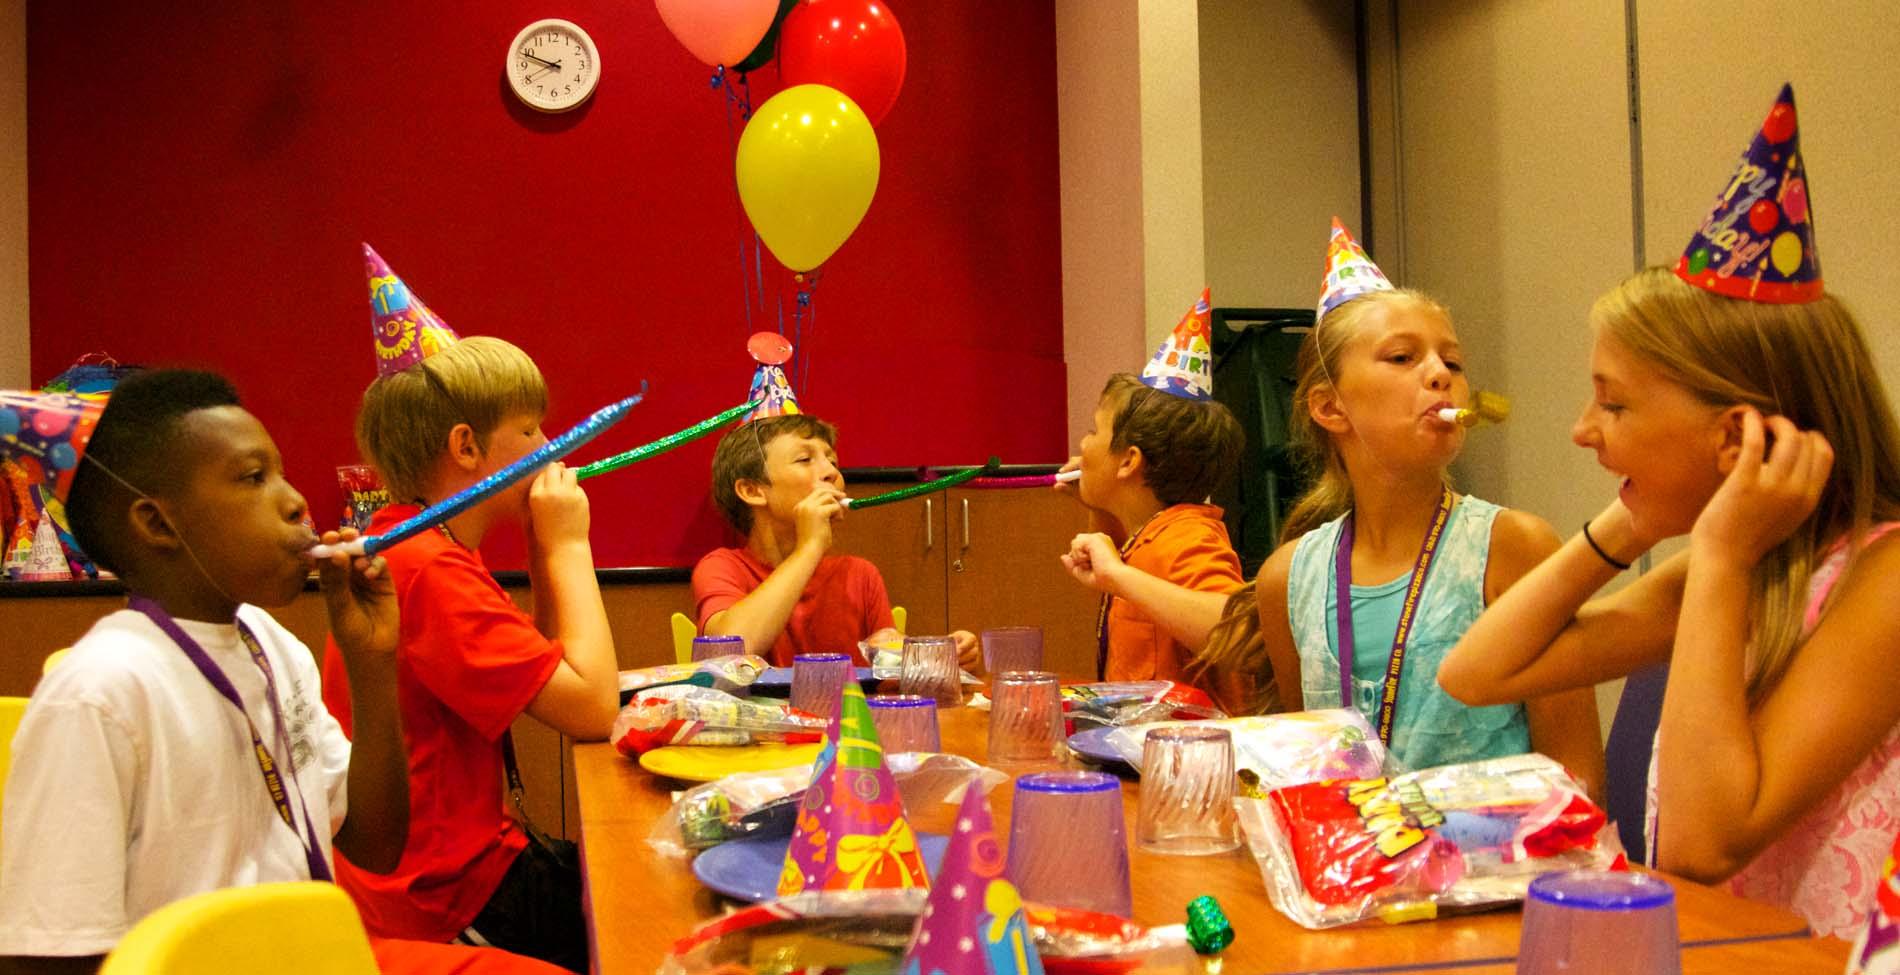 Myrtle Beach Birthday Ideas